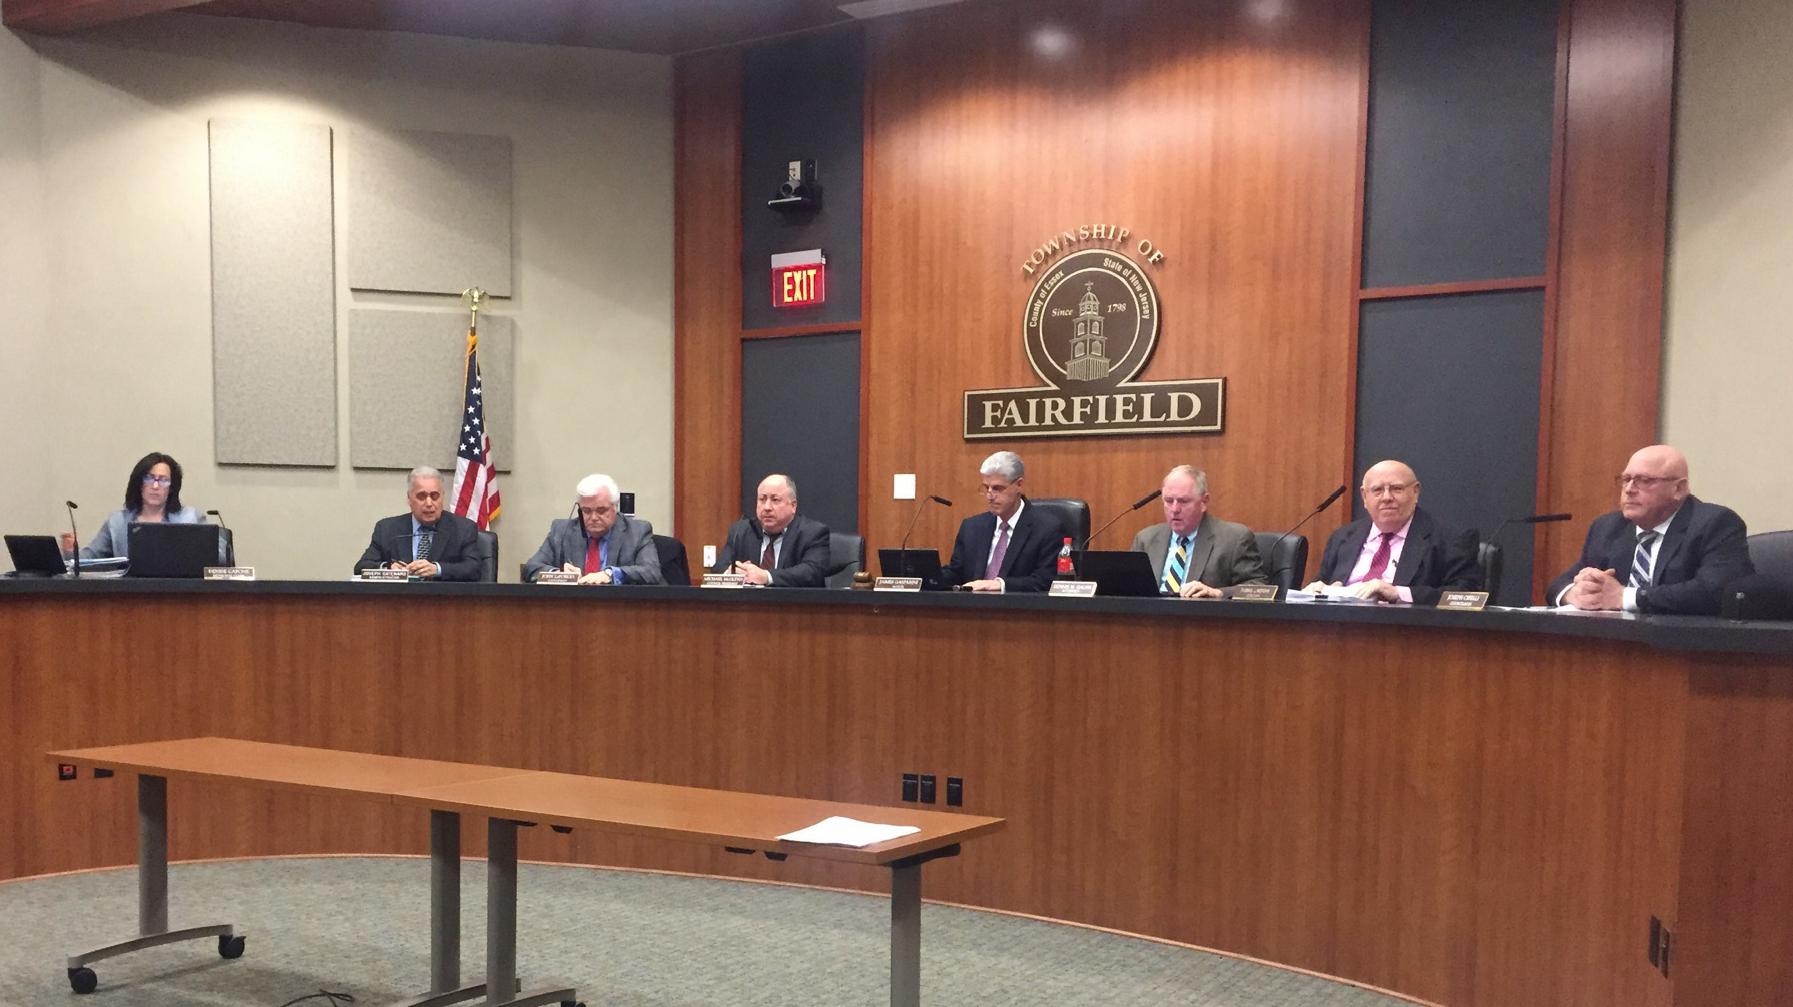 Fairfield Township Council Announces Promotion of Fairfield